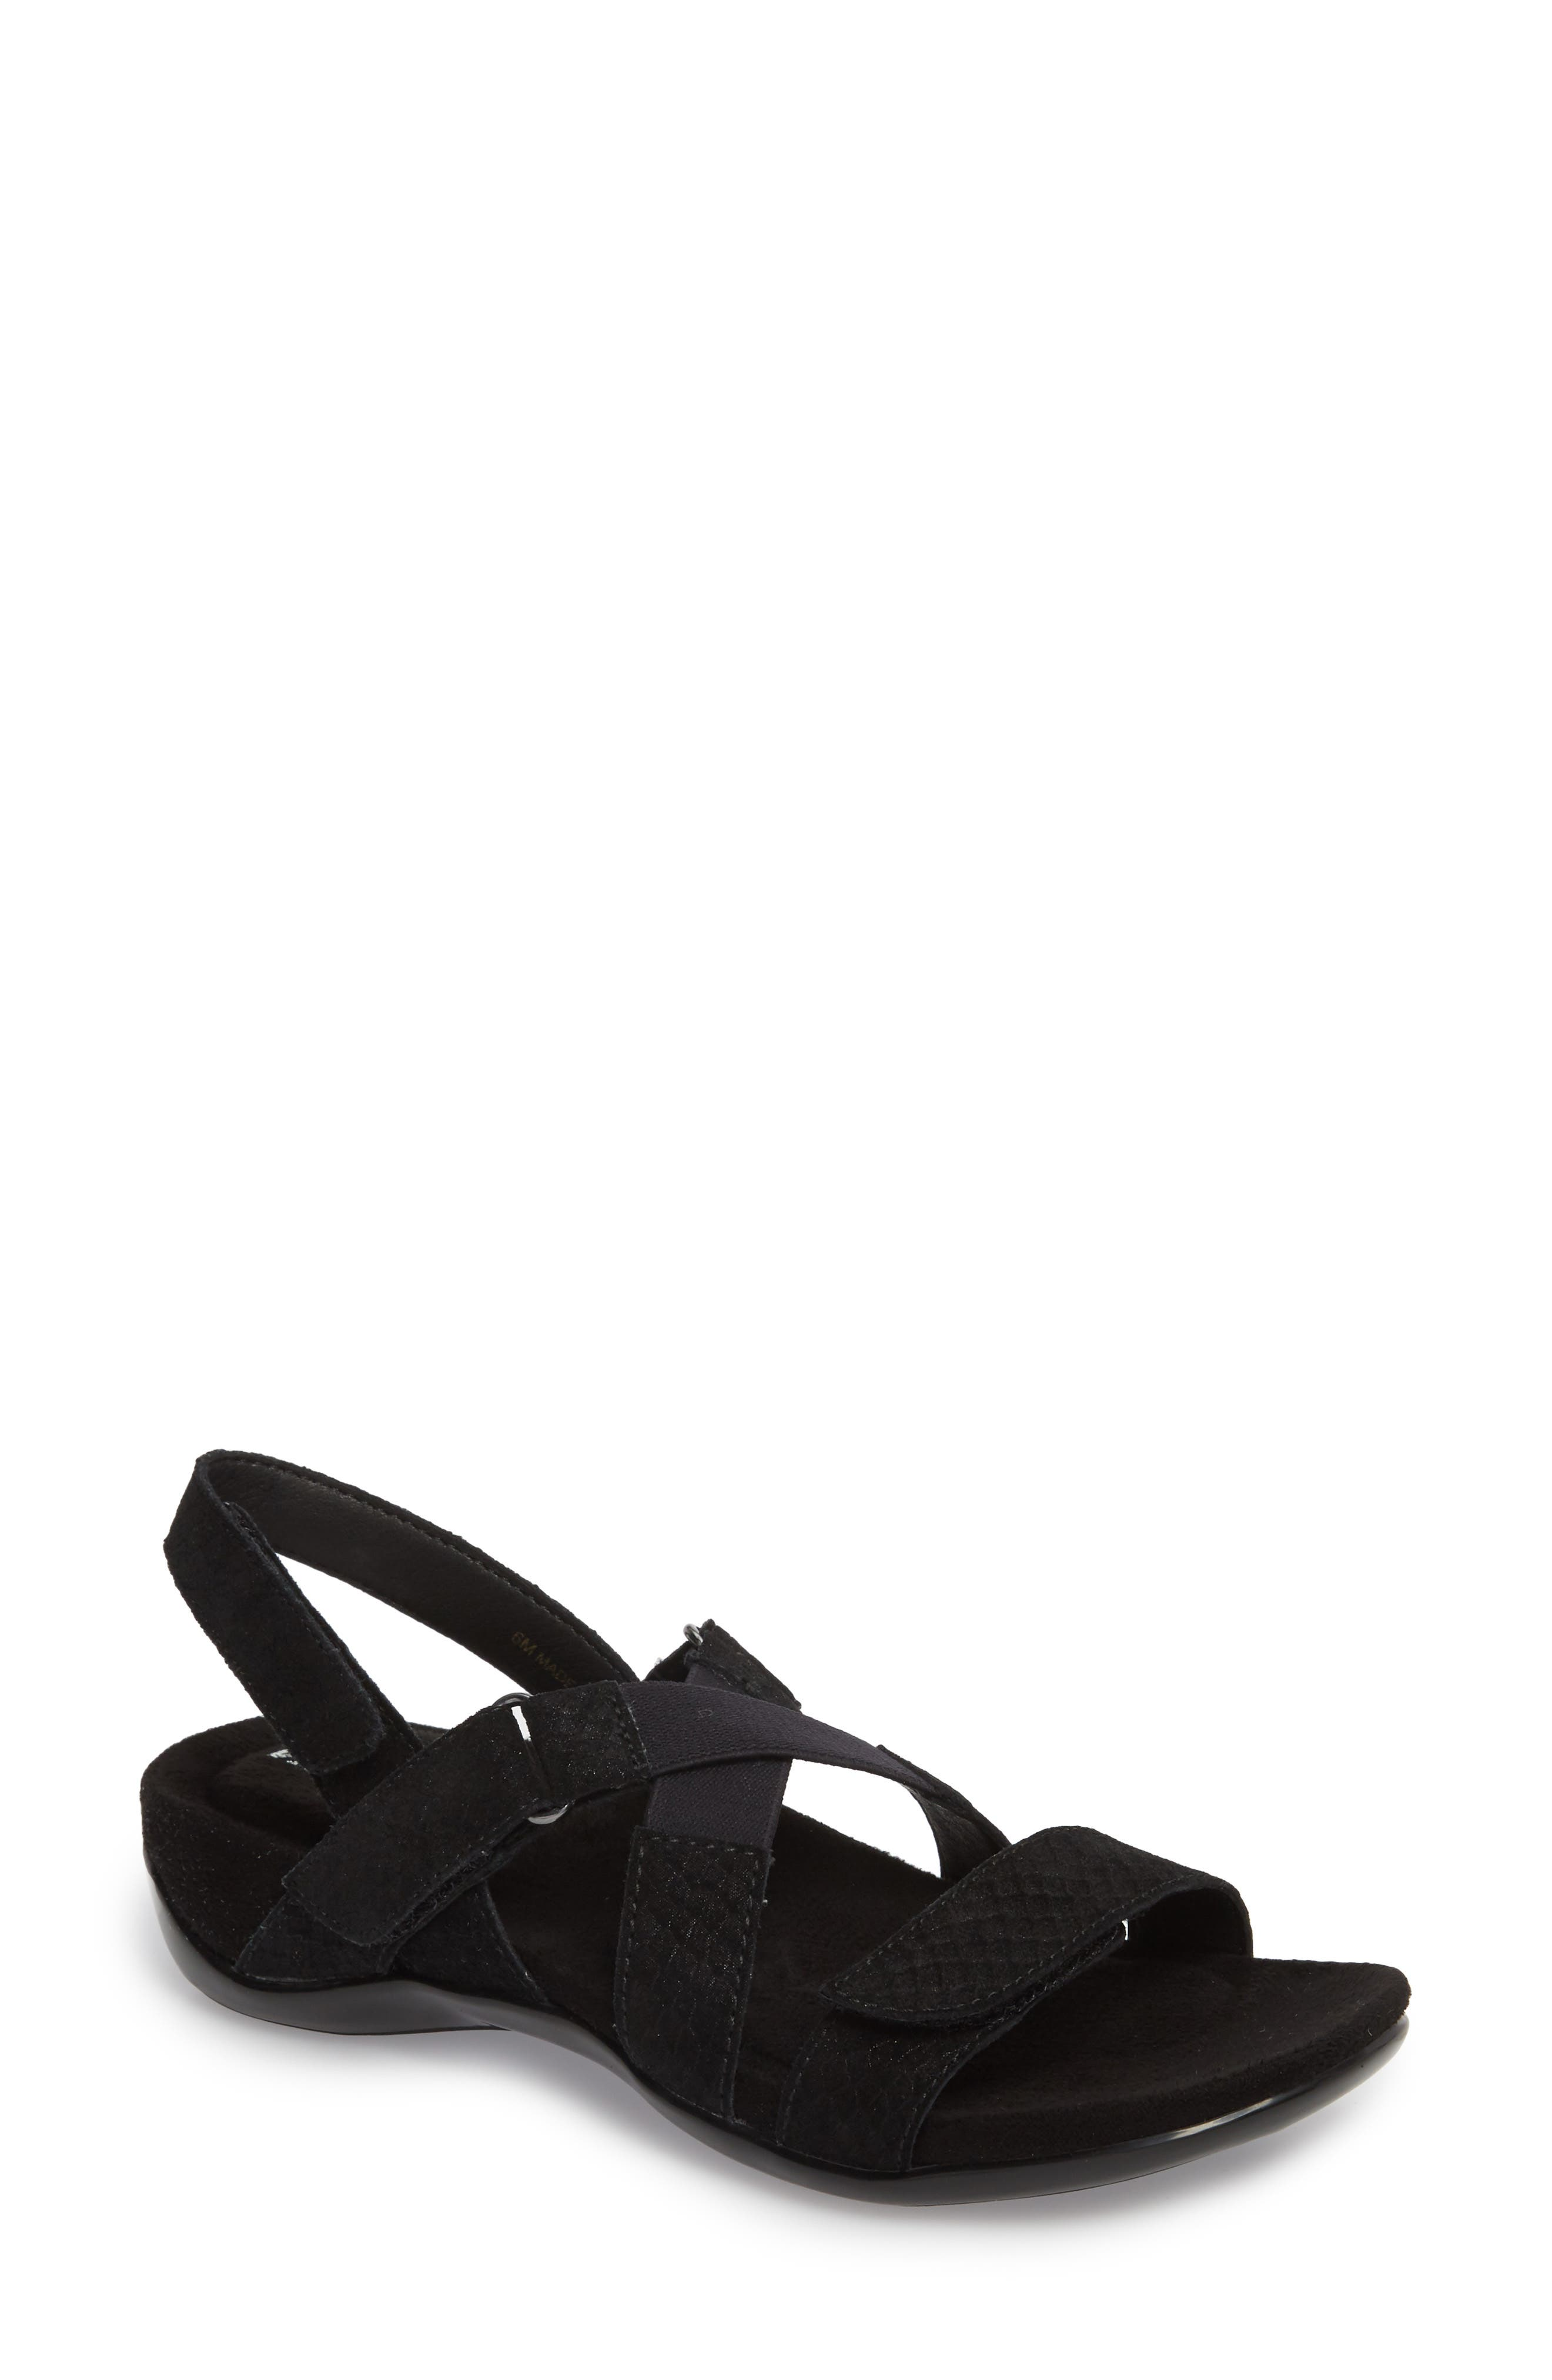 Vicki Slingback Sandal,                         Main,                         color, Black Printed Leather